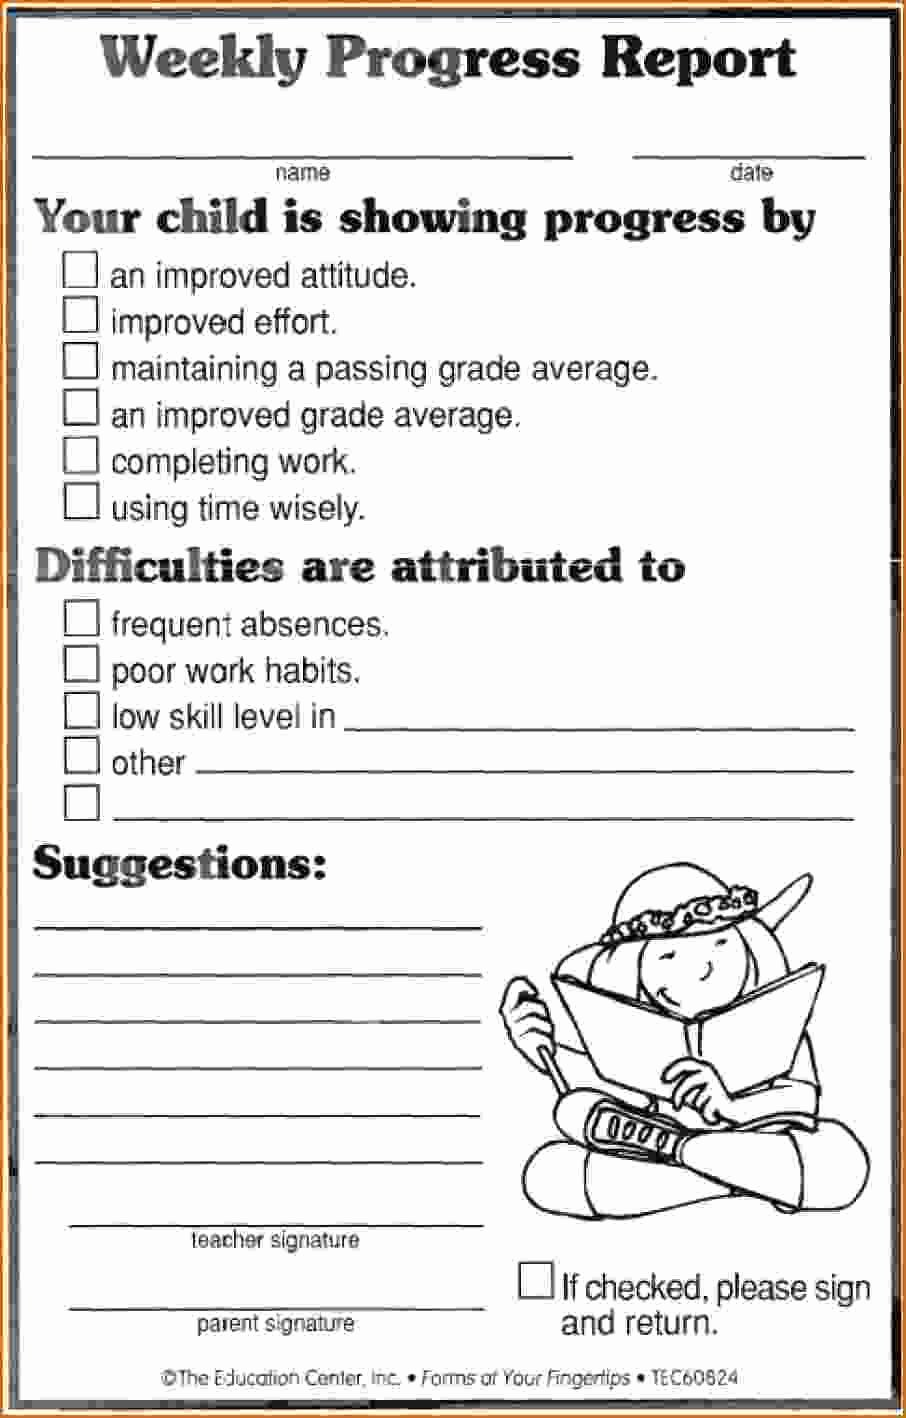 School Progress Report Template Beautiful 12 Weekly Progress Report Template